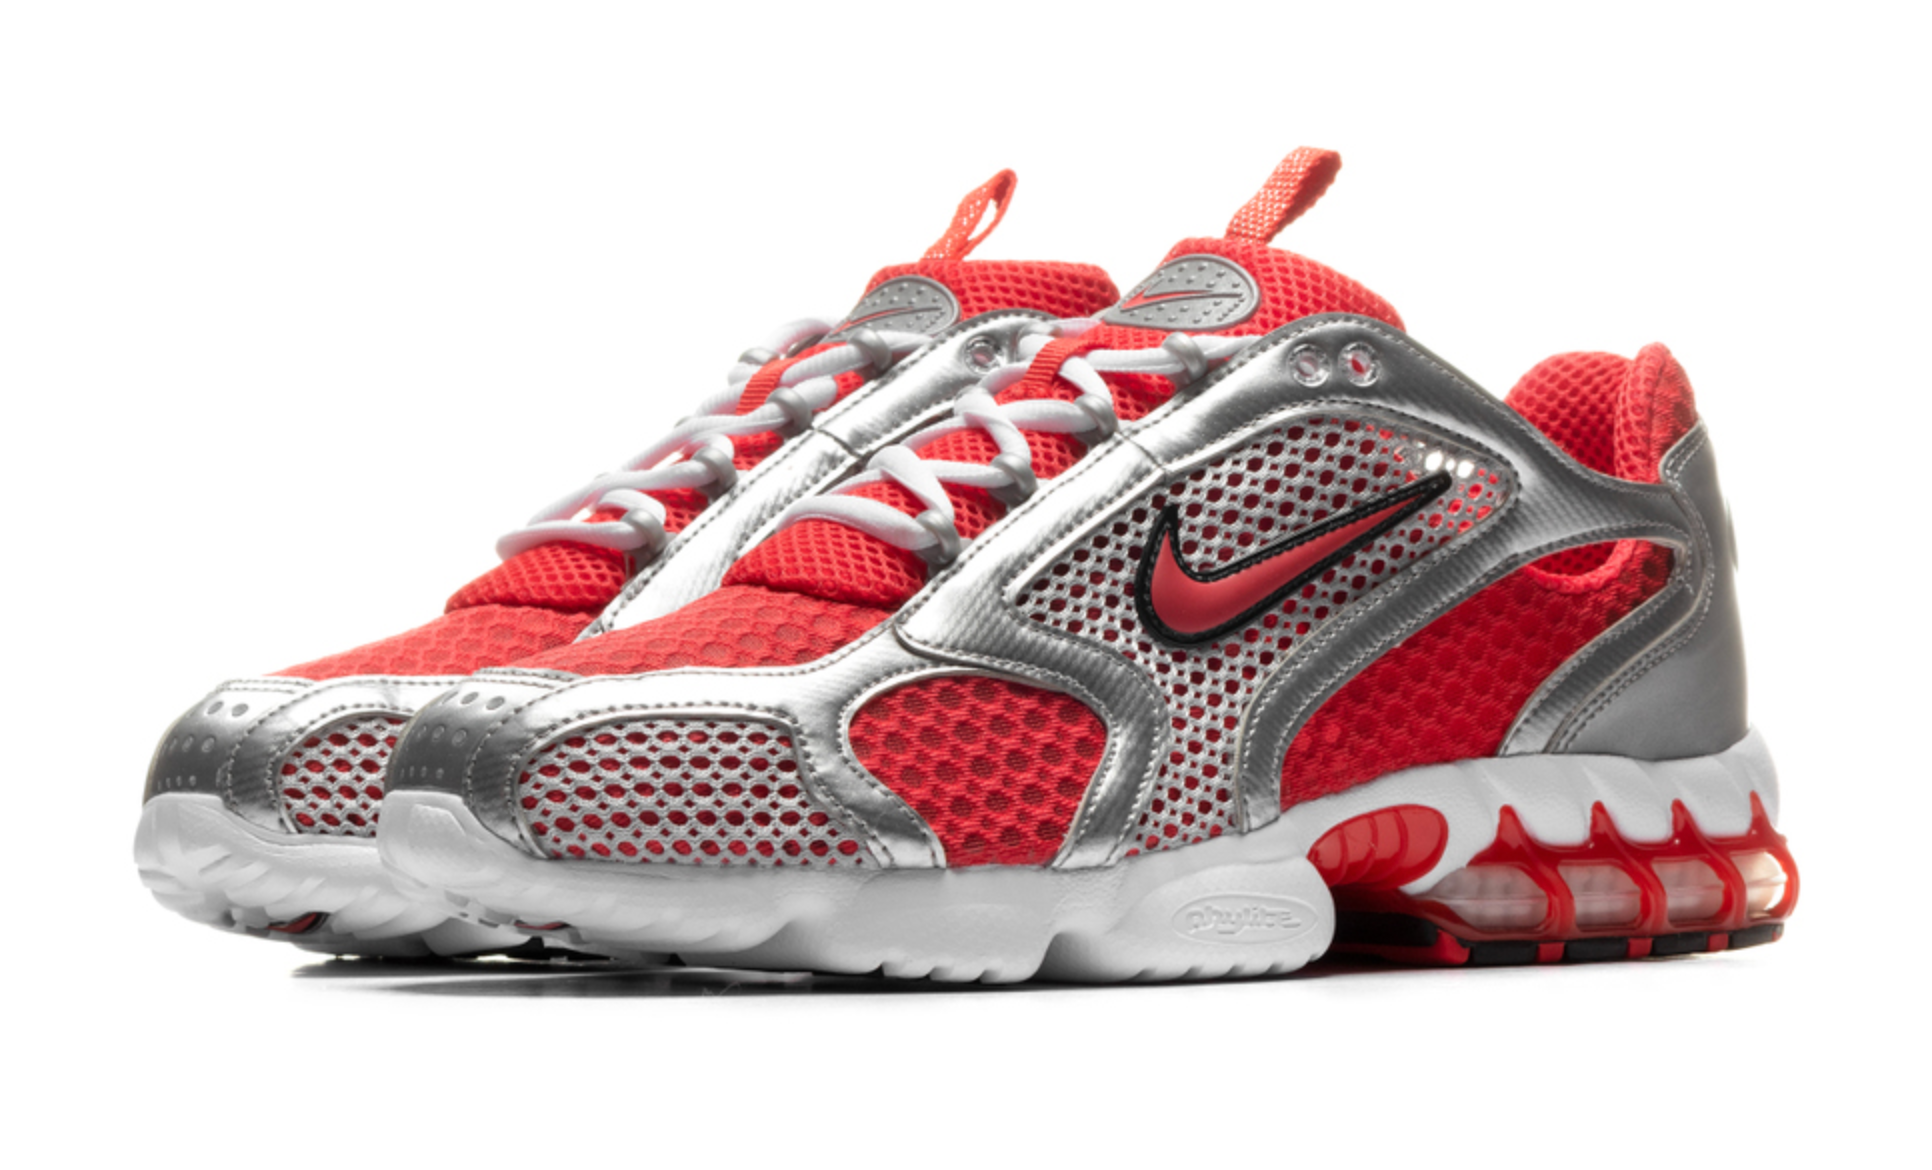 Nike Zoom Spiridon Cage 2 'Track Red'